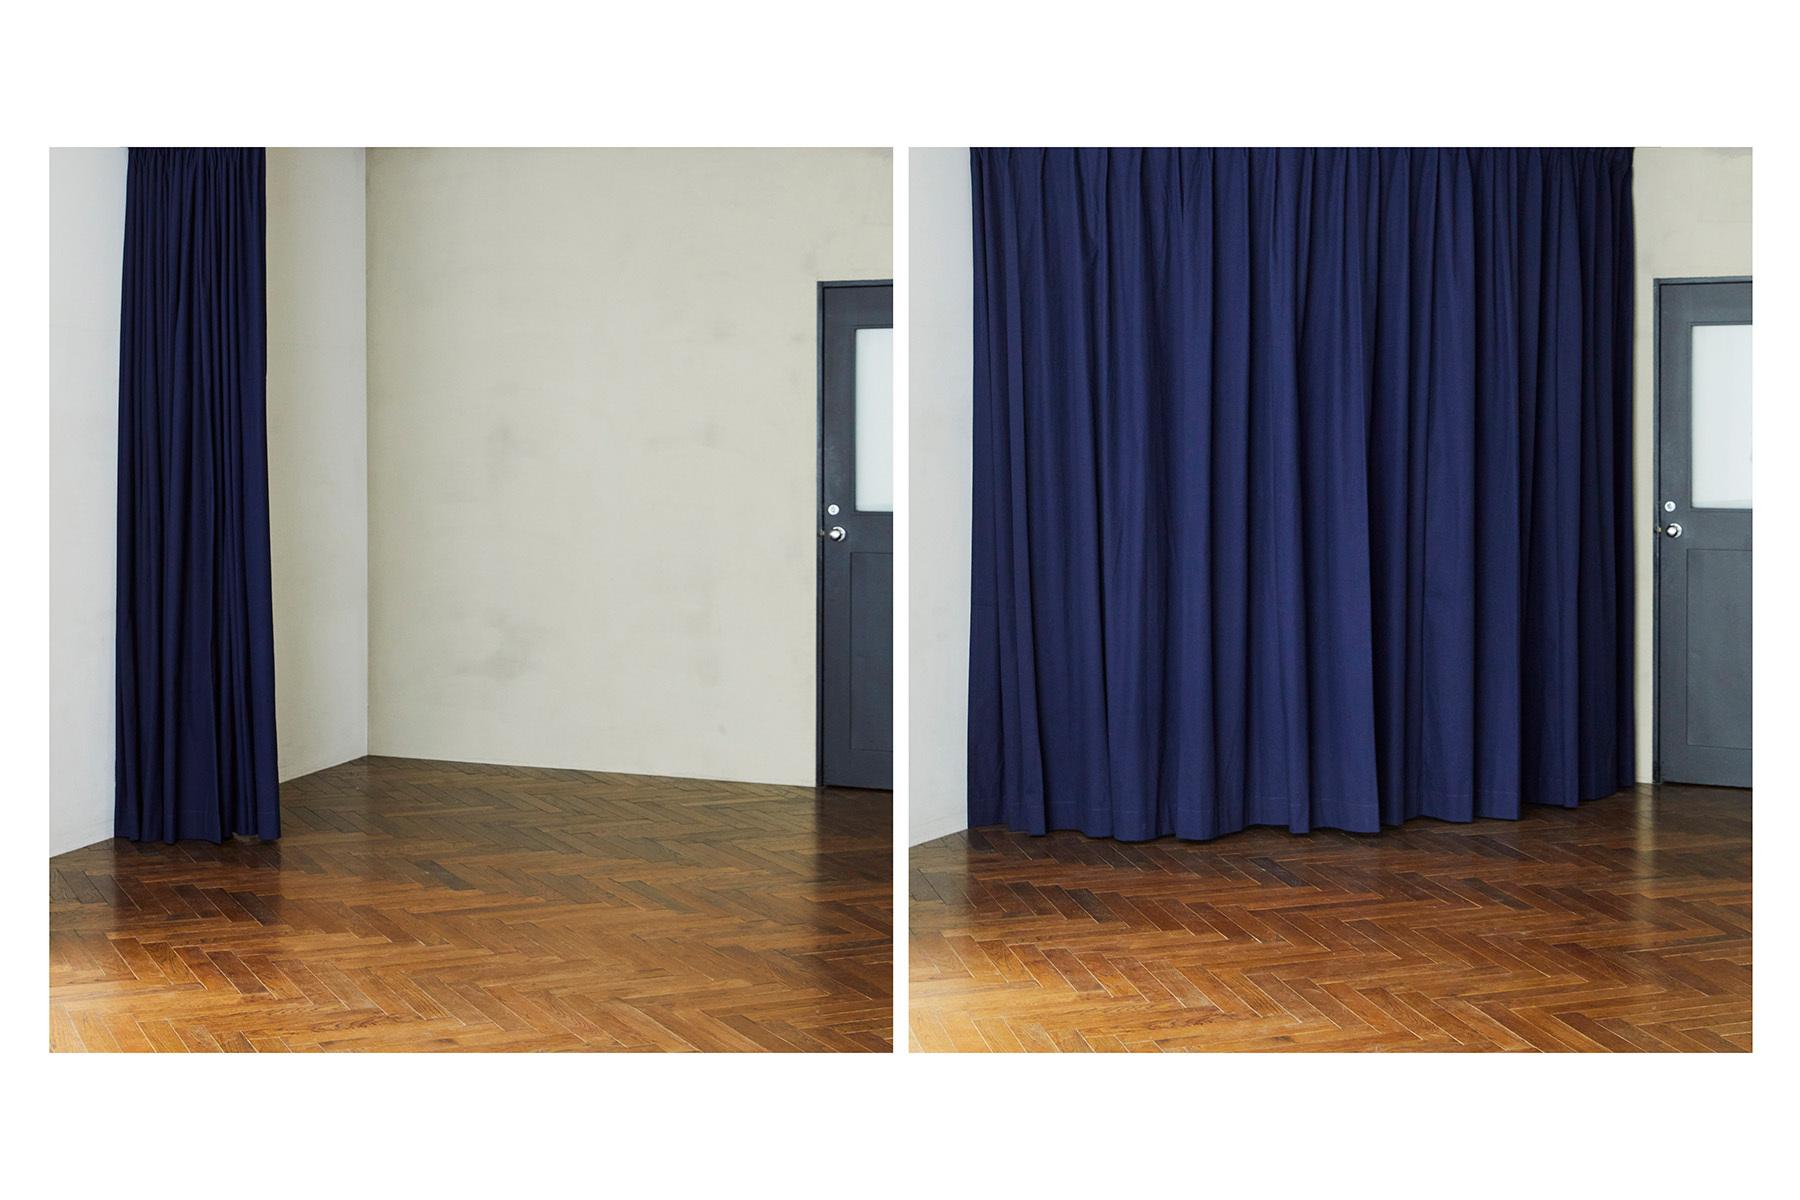 AtelierSix Studio&Prop (アトリエシックス)option:屋上で白バック撮影